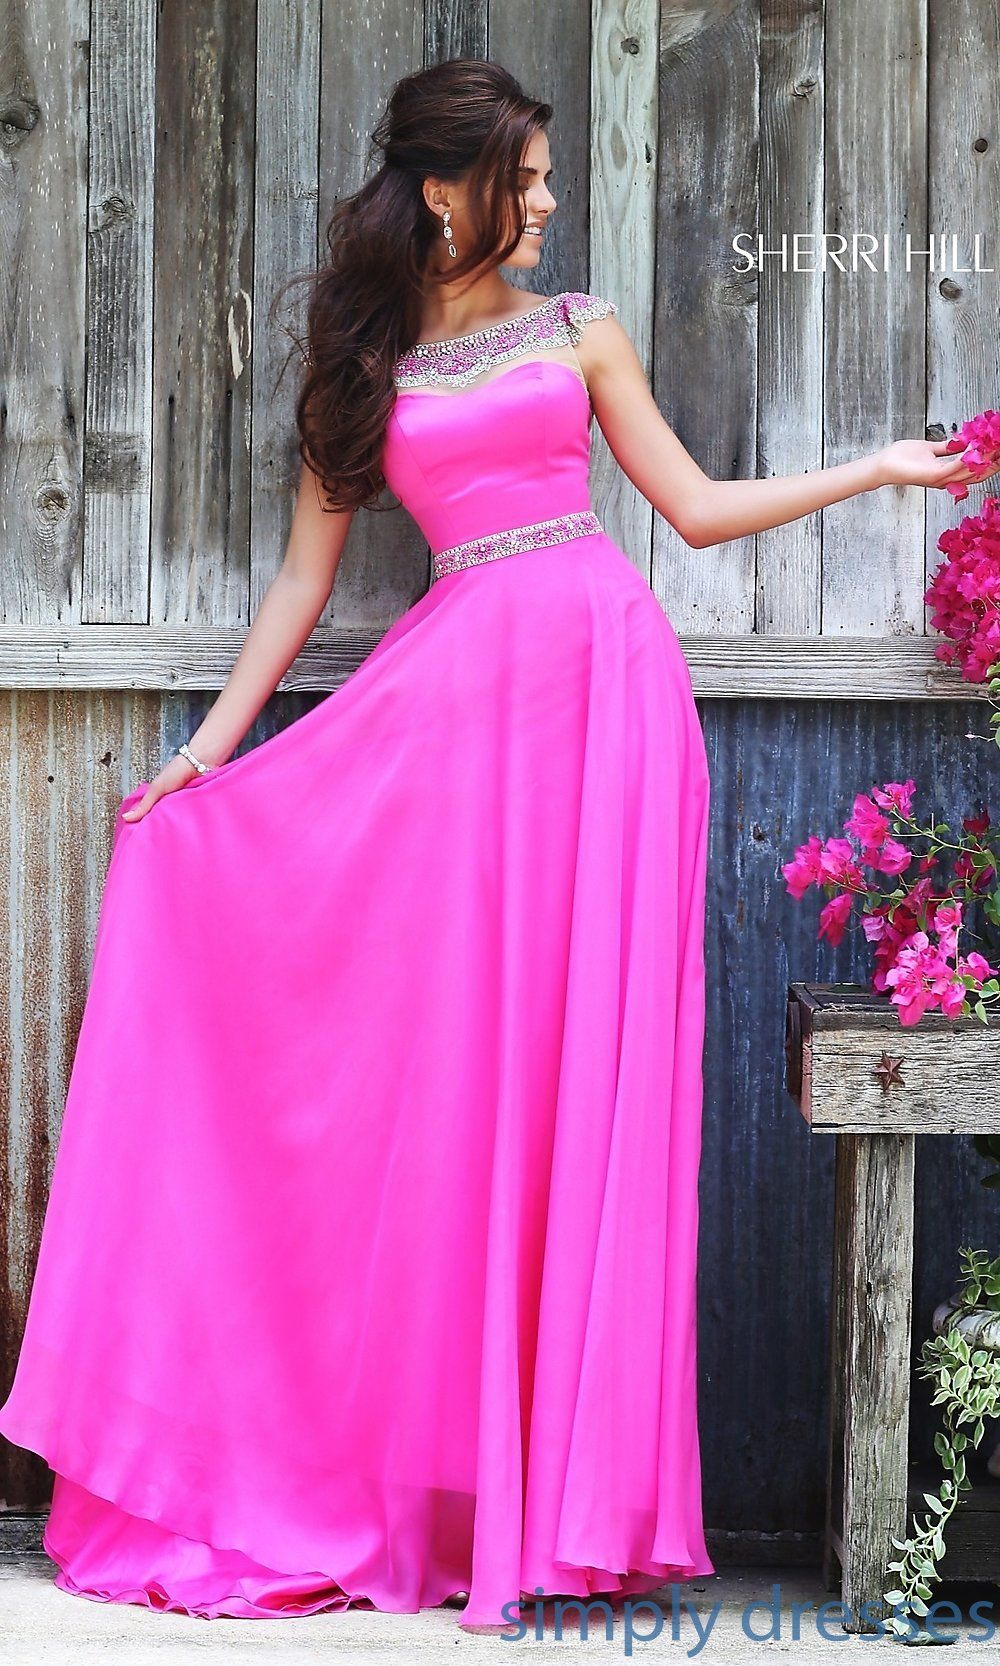 Homecoming Dresses, Formal Prom Dresses, Evening Wear: SH-32220 ...